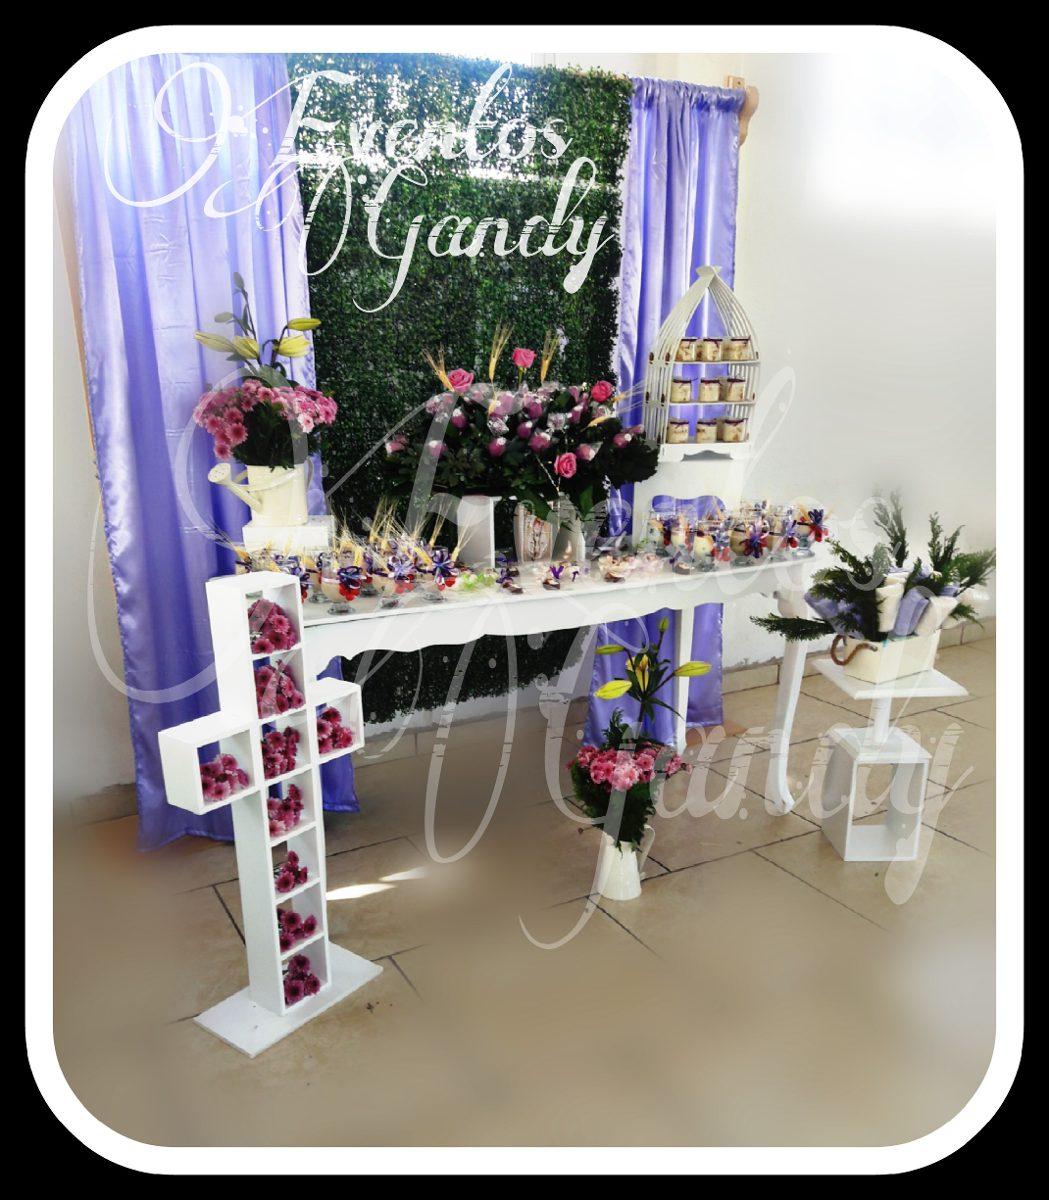 Backdrop cortinero fondo para mesa de dulces for Bases para colgar cortinas